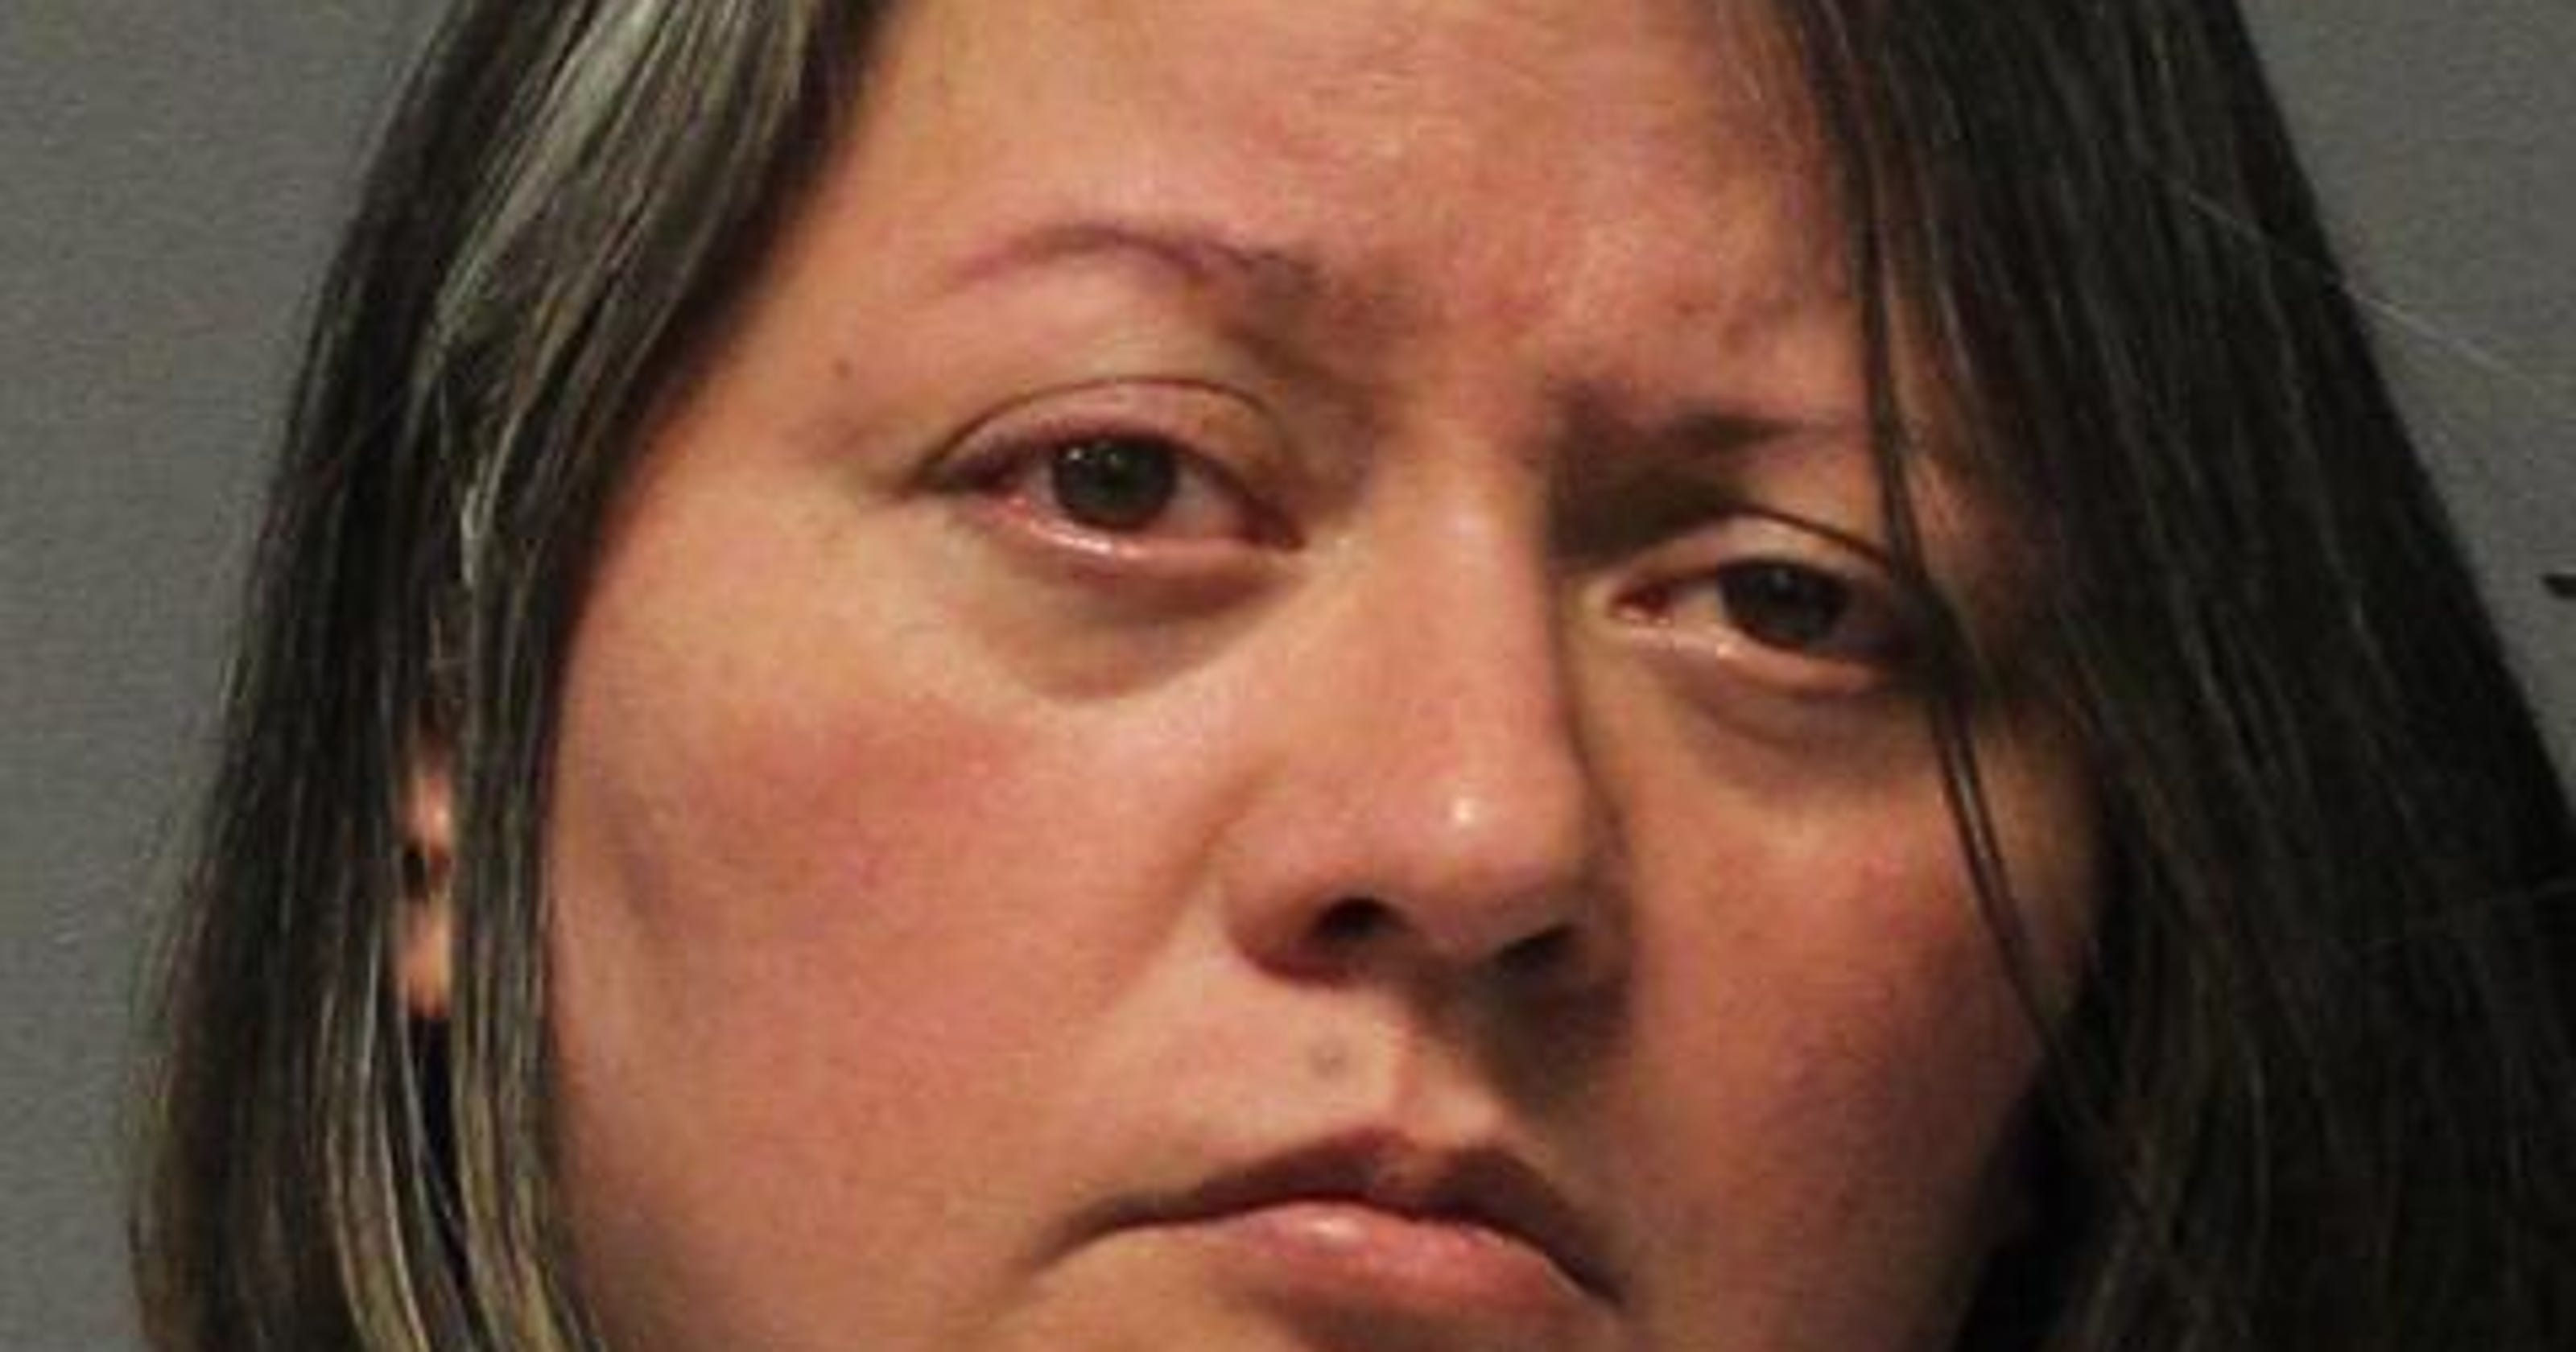 Police: Idaho family behind fatal Walmart brawl